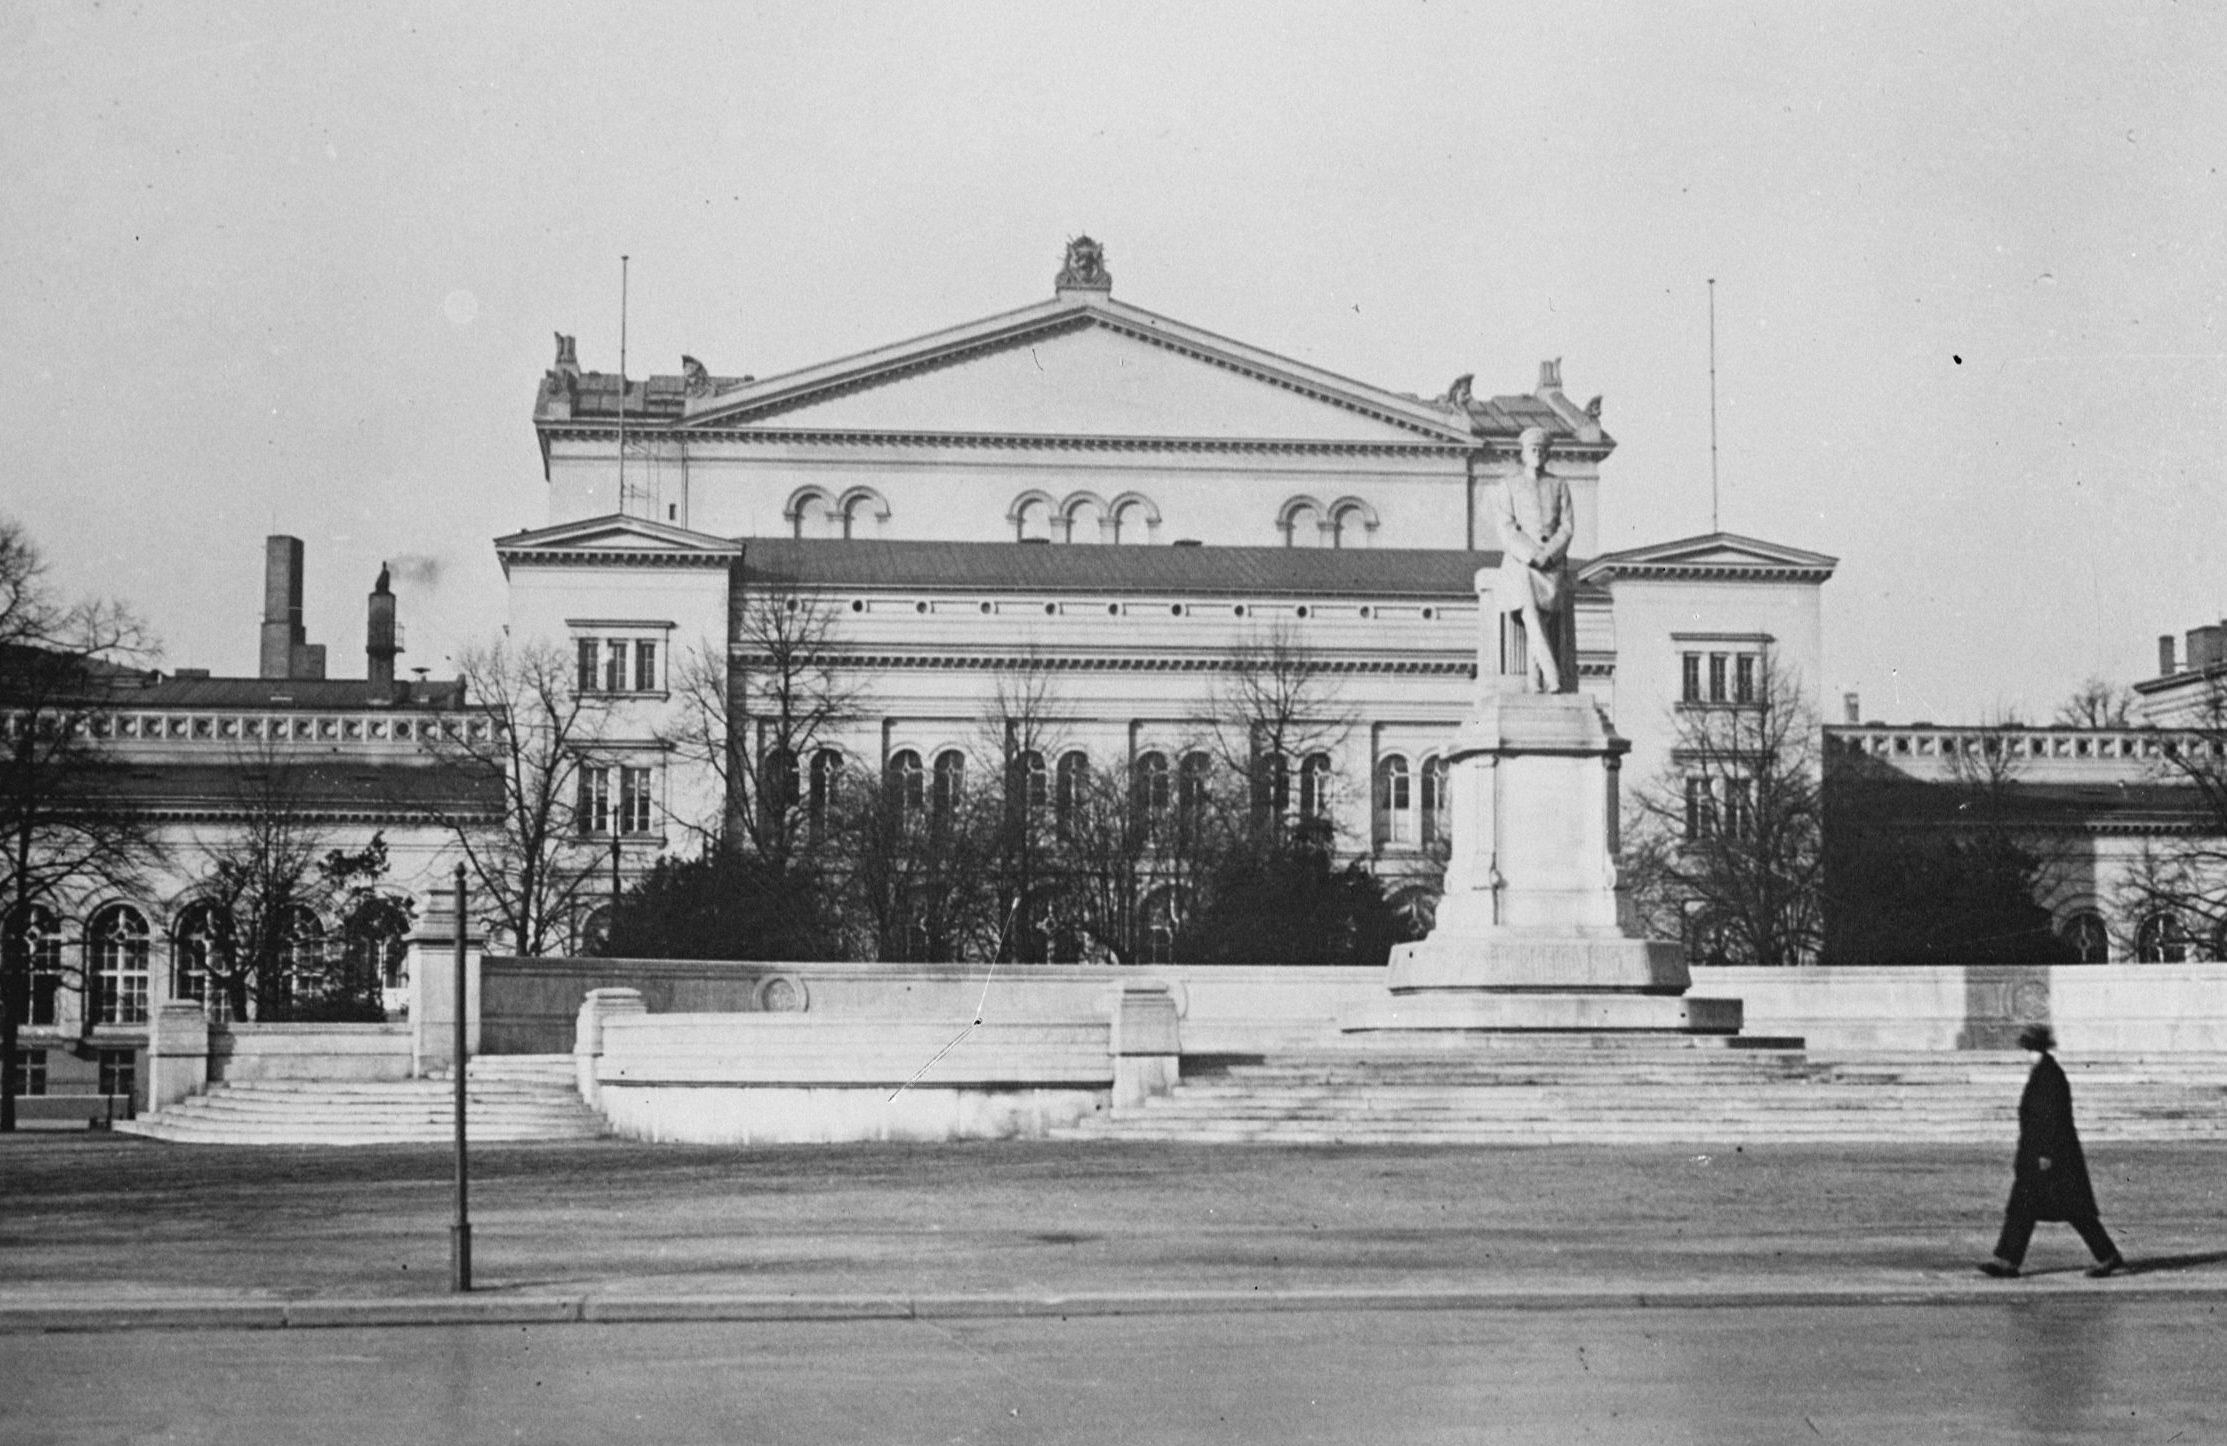 Die Krolloper in Berlin, 1933. Foto: Imago/Topfoto/United Archives International